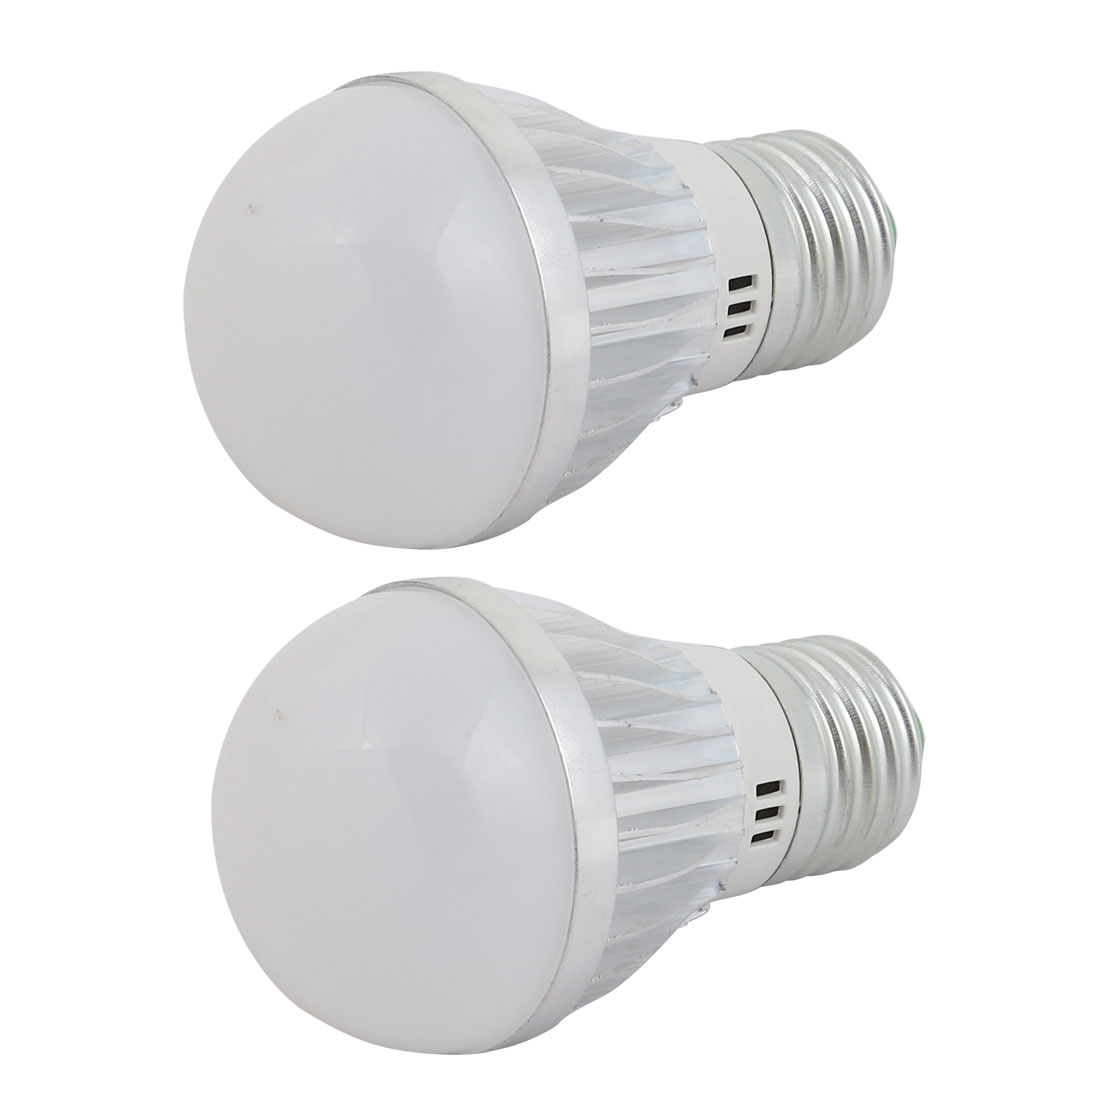 2 Pcs 3W Slivery Aluminum Ball - Bulb Lamp Housing E27 Screw Base w White Cover